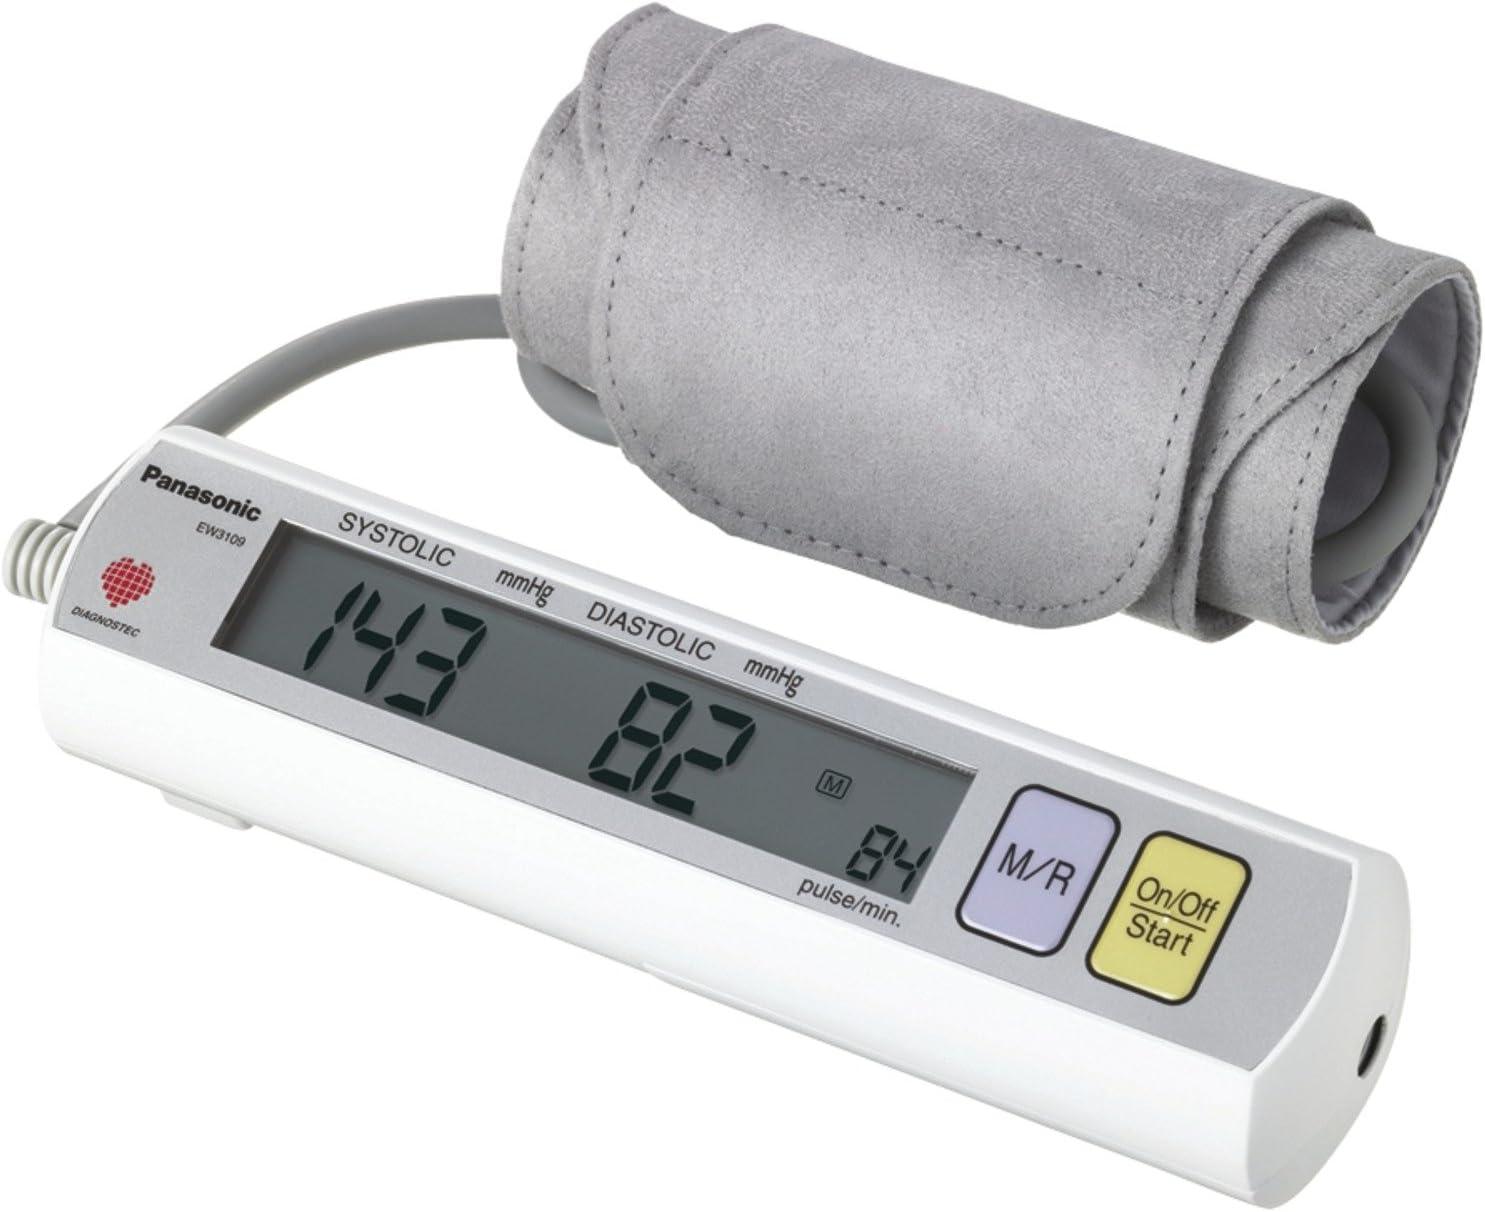 Panasonic EW3109W Portable Upper Arm Blood Pressure Monitor White Grey